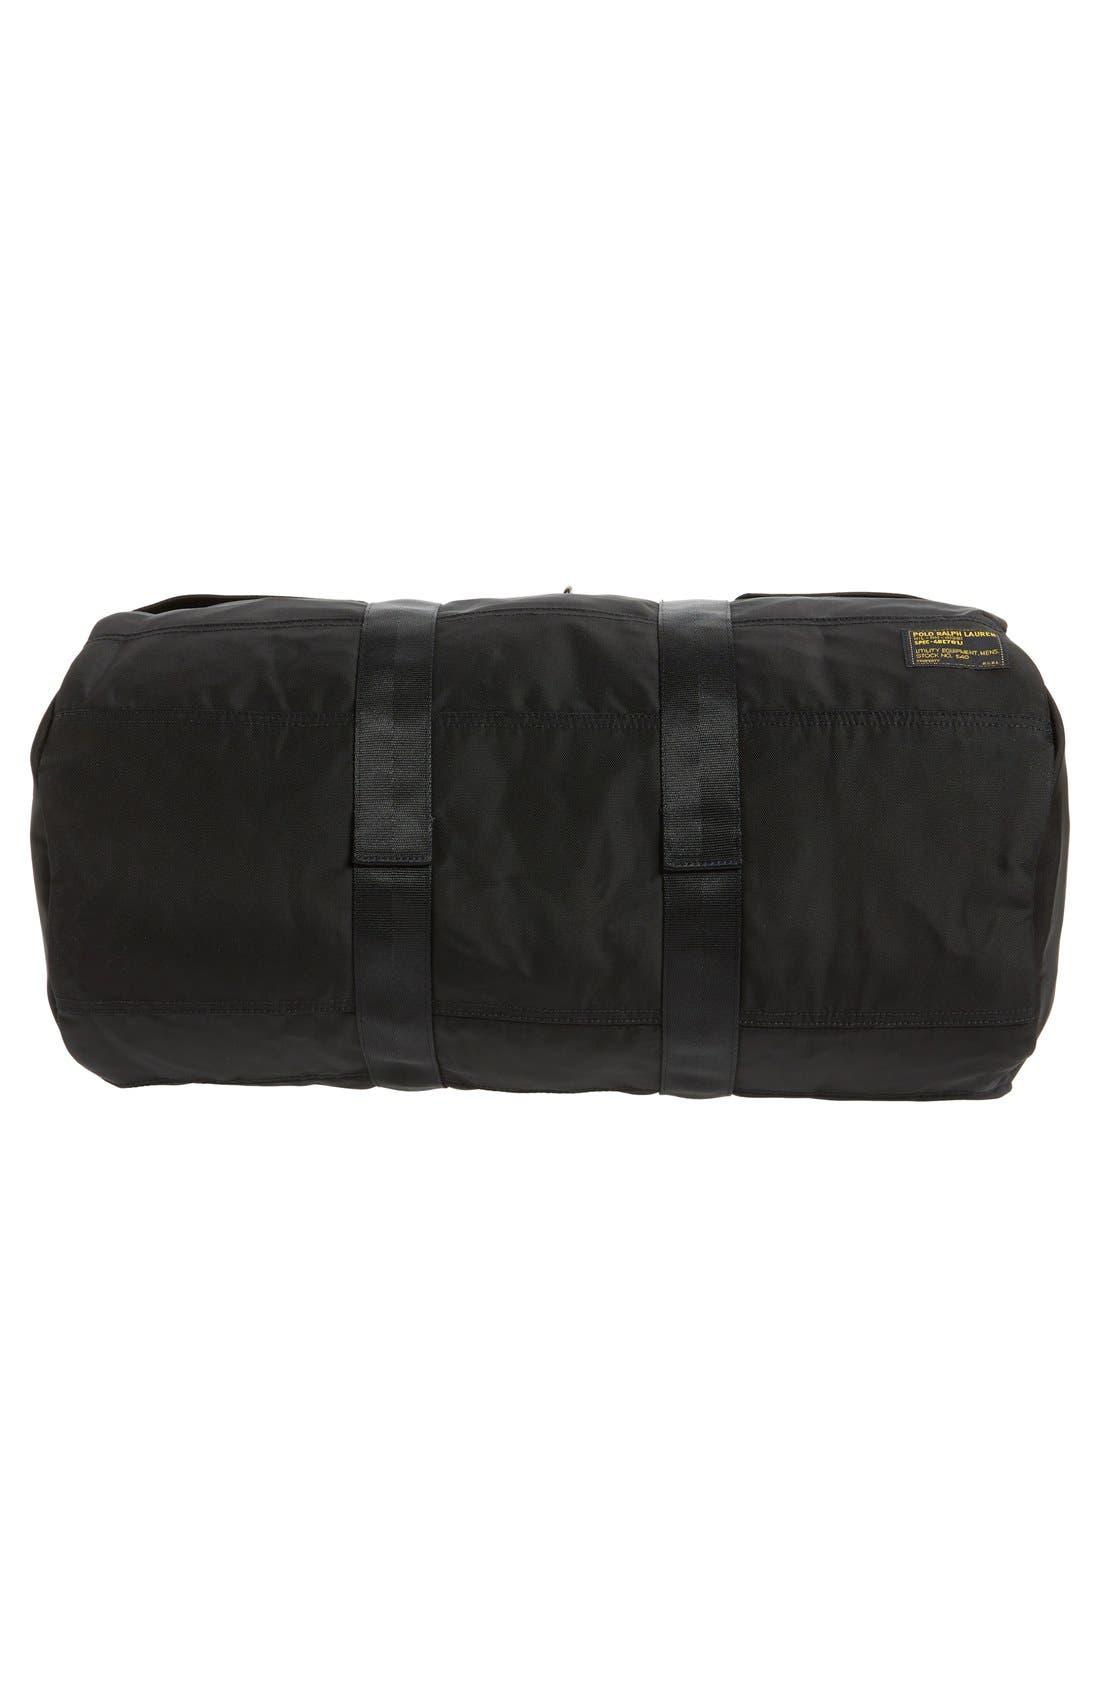 ... discount code for polo ralph lauren nylon duffel bag nordstrom 23eda  48ce1 2e2ce6084ab09